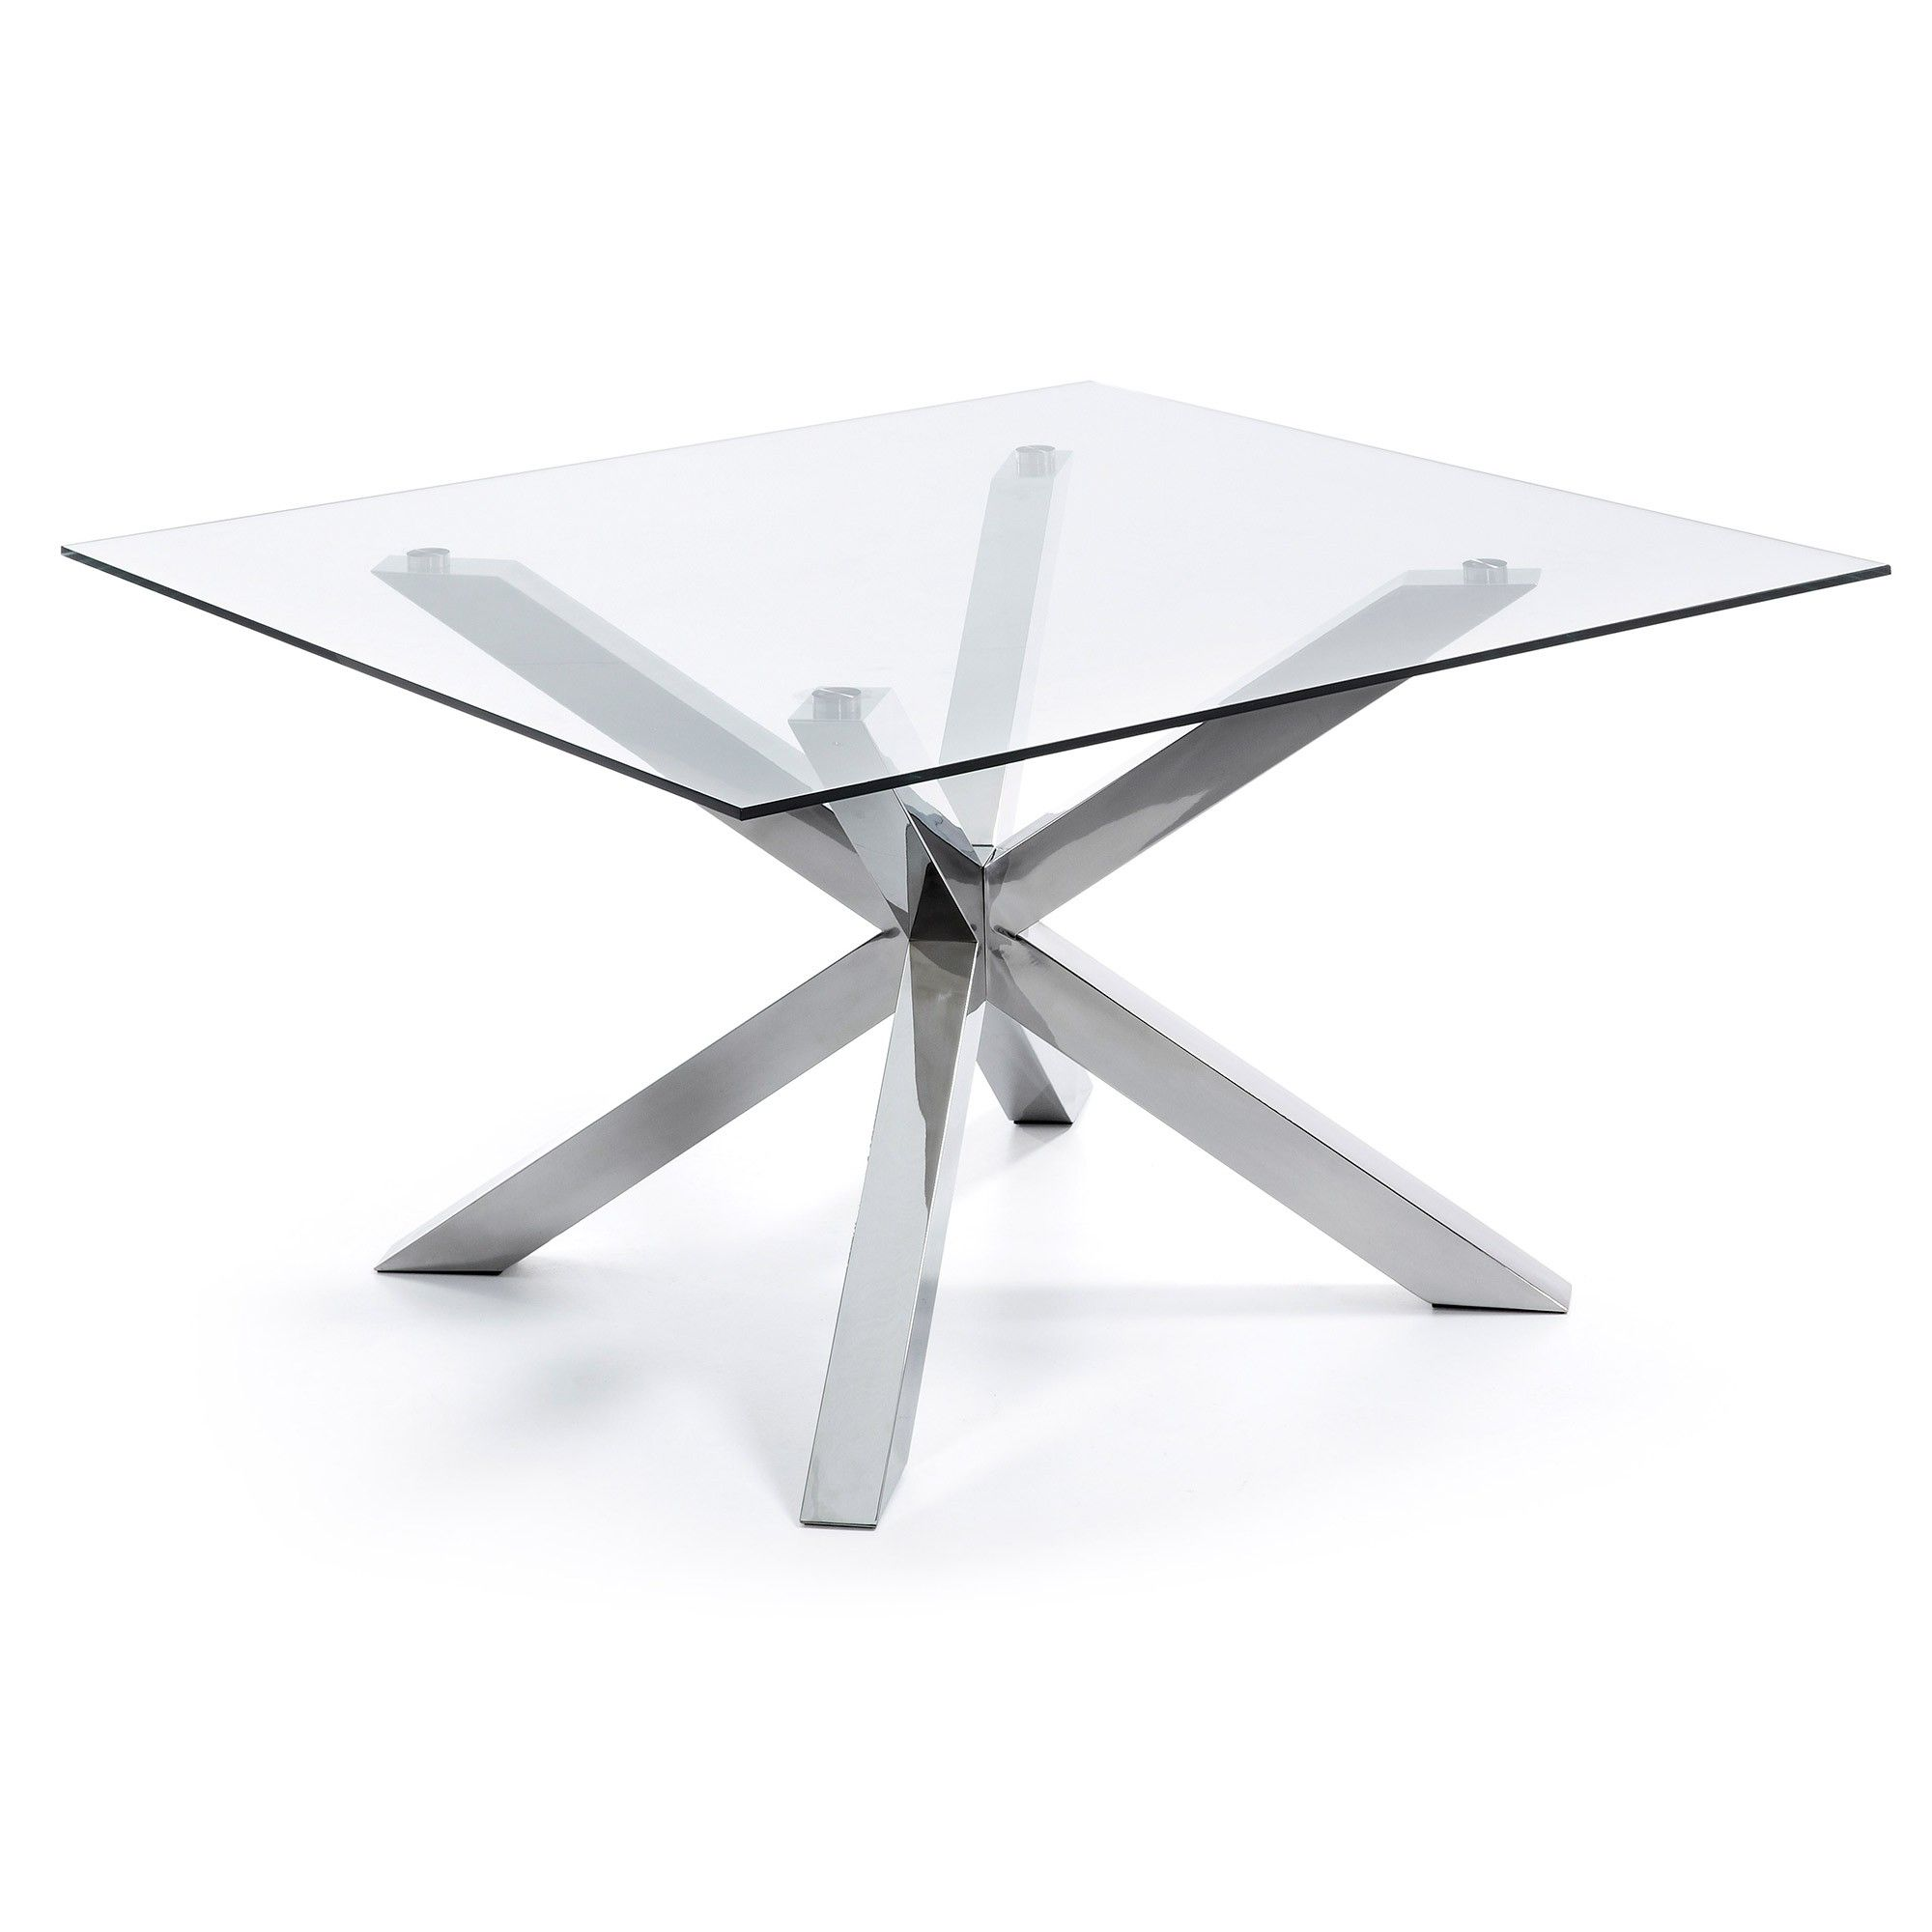 Table Argo 149x149 cm, inox et verre